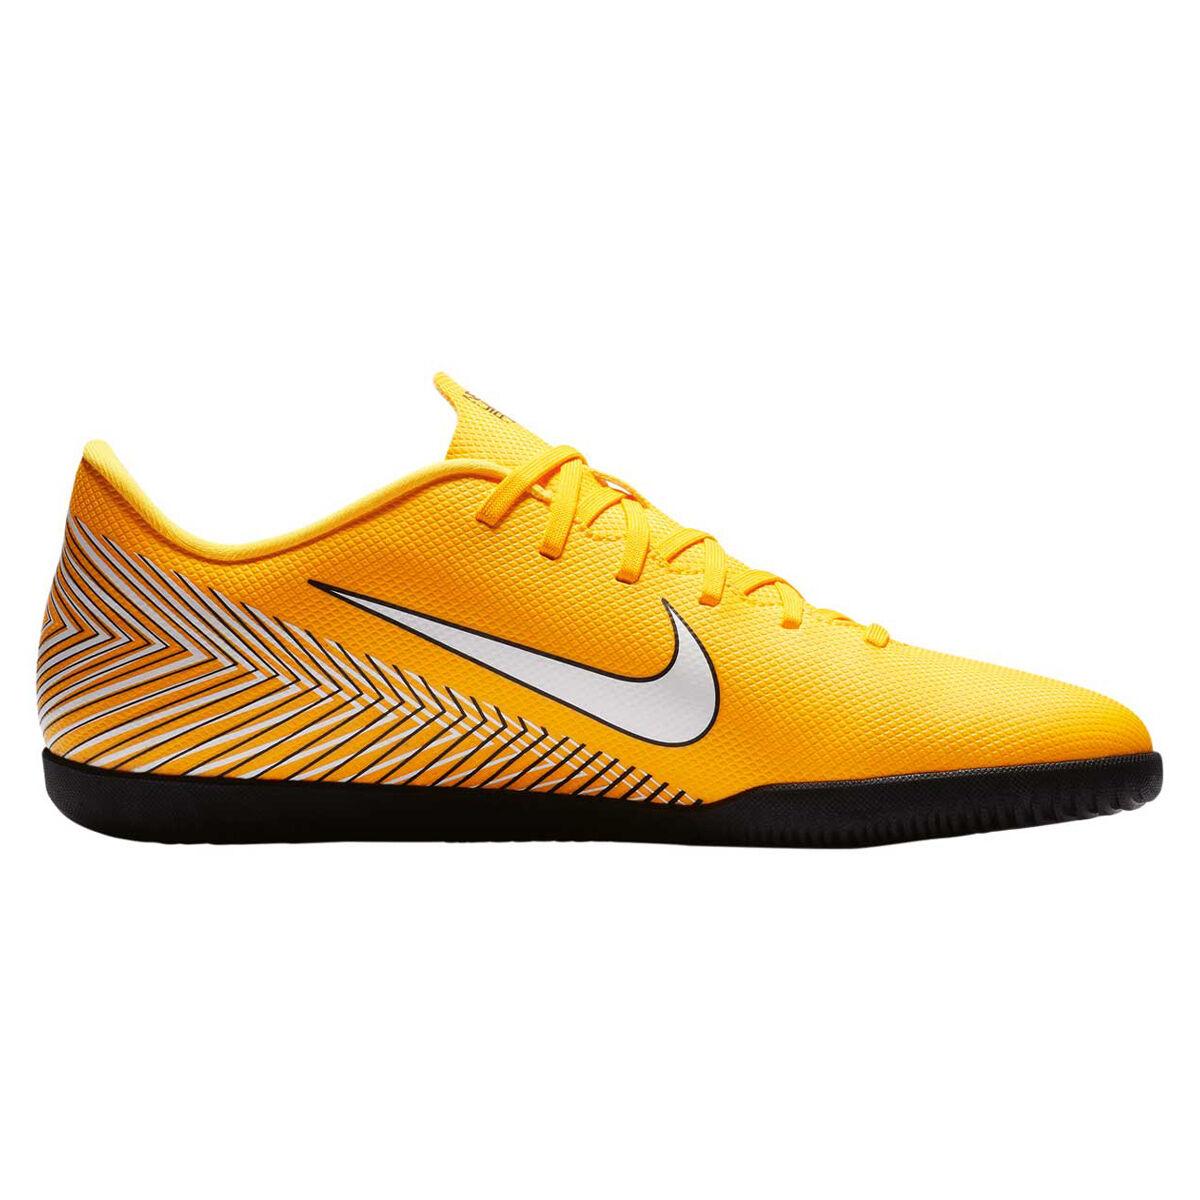 Club Neymar Jr Mens Indoor Soccer Shoes